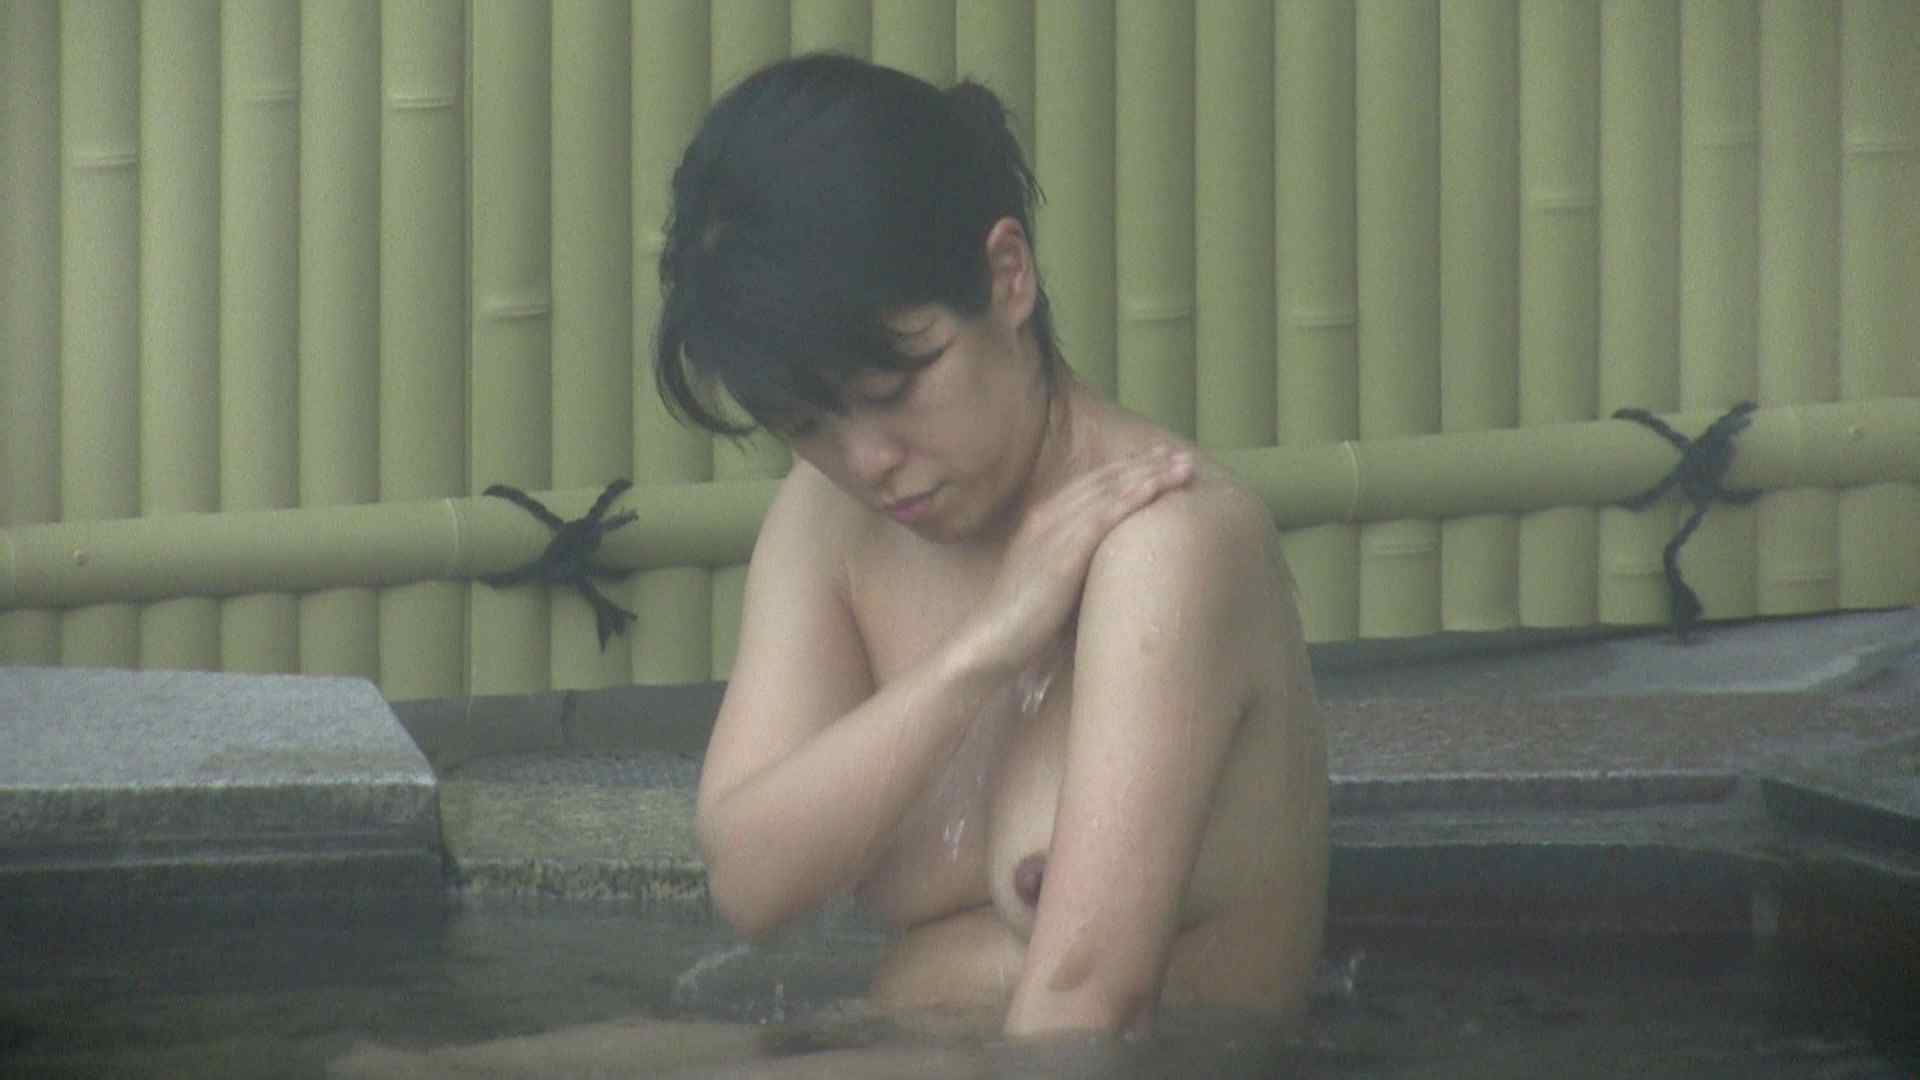 Aquaな露天風呂Vol.585 盗撮 | OLエロ画像  78PICs 55